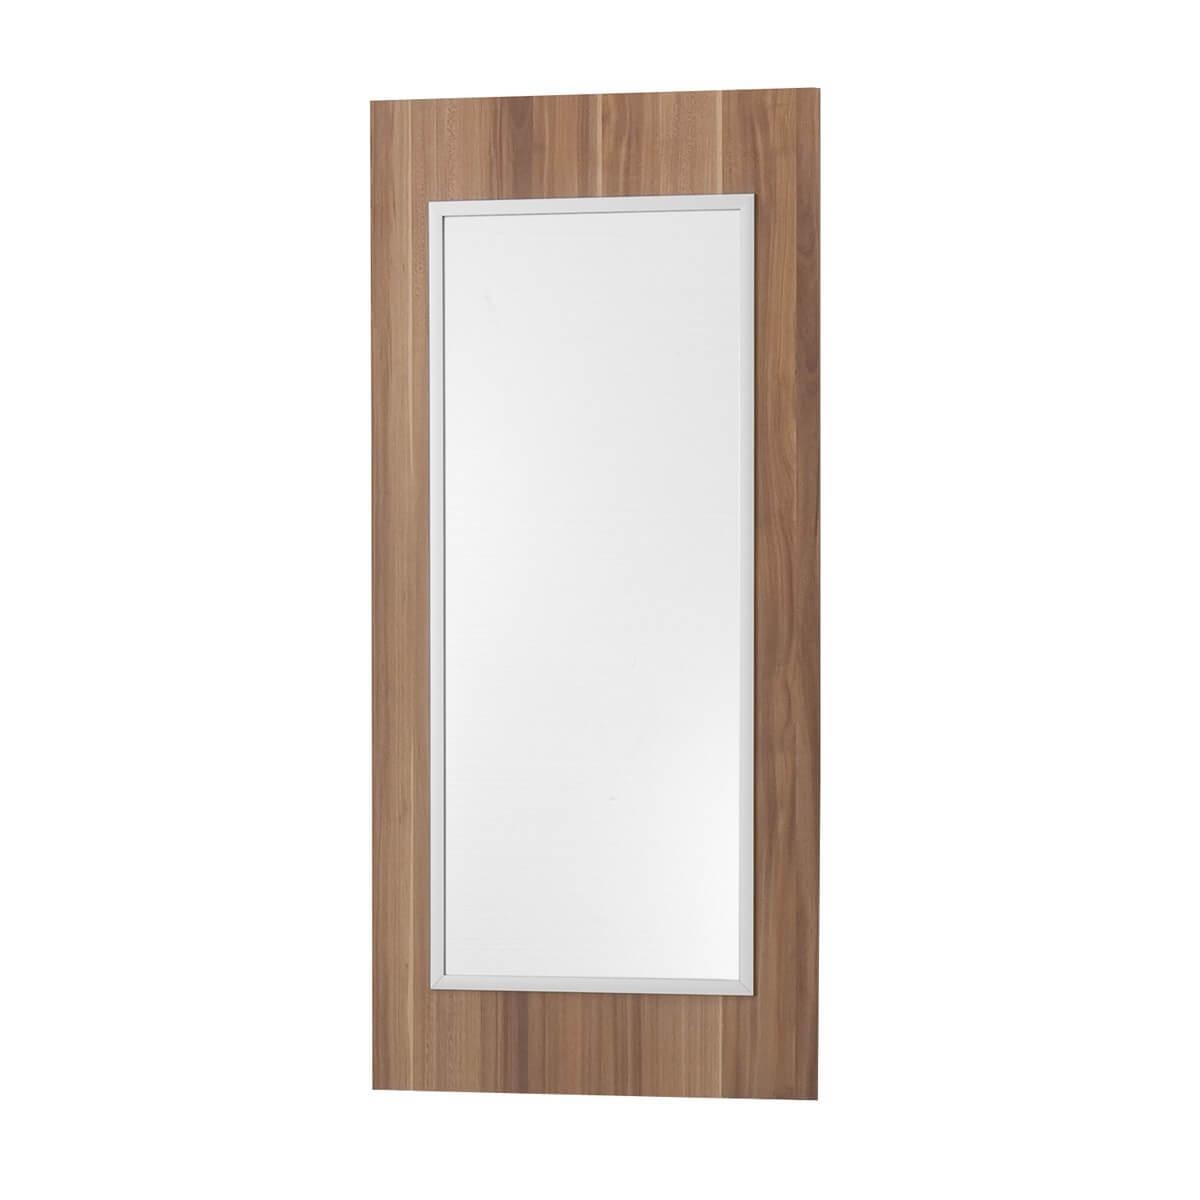 Wandspiegel zwetschge m bel fr m bel24 for Moebel24 shop